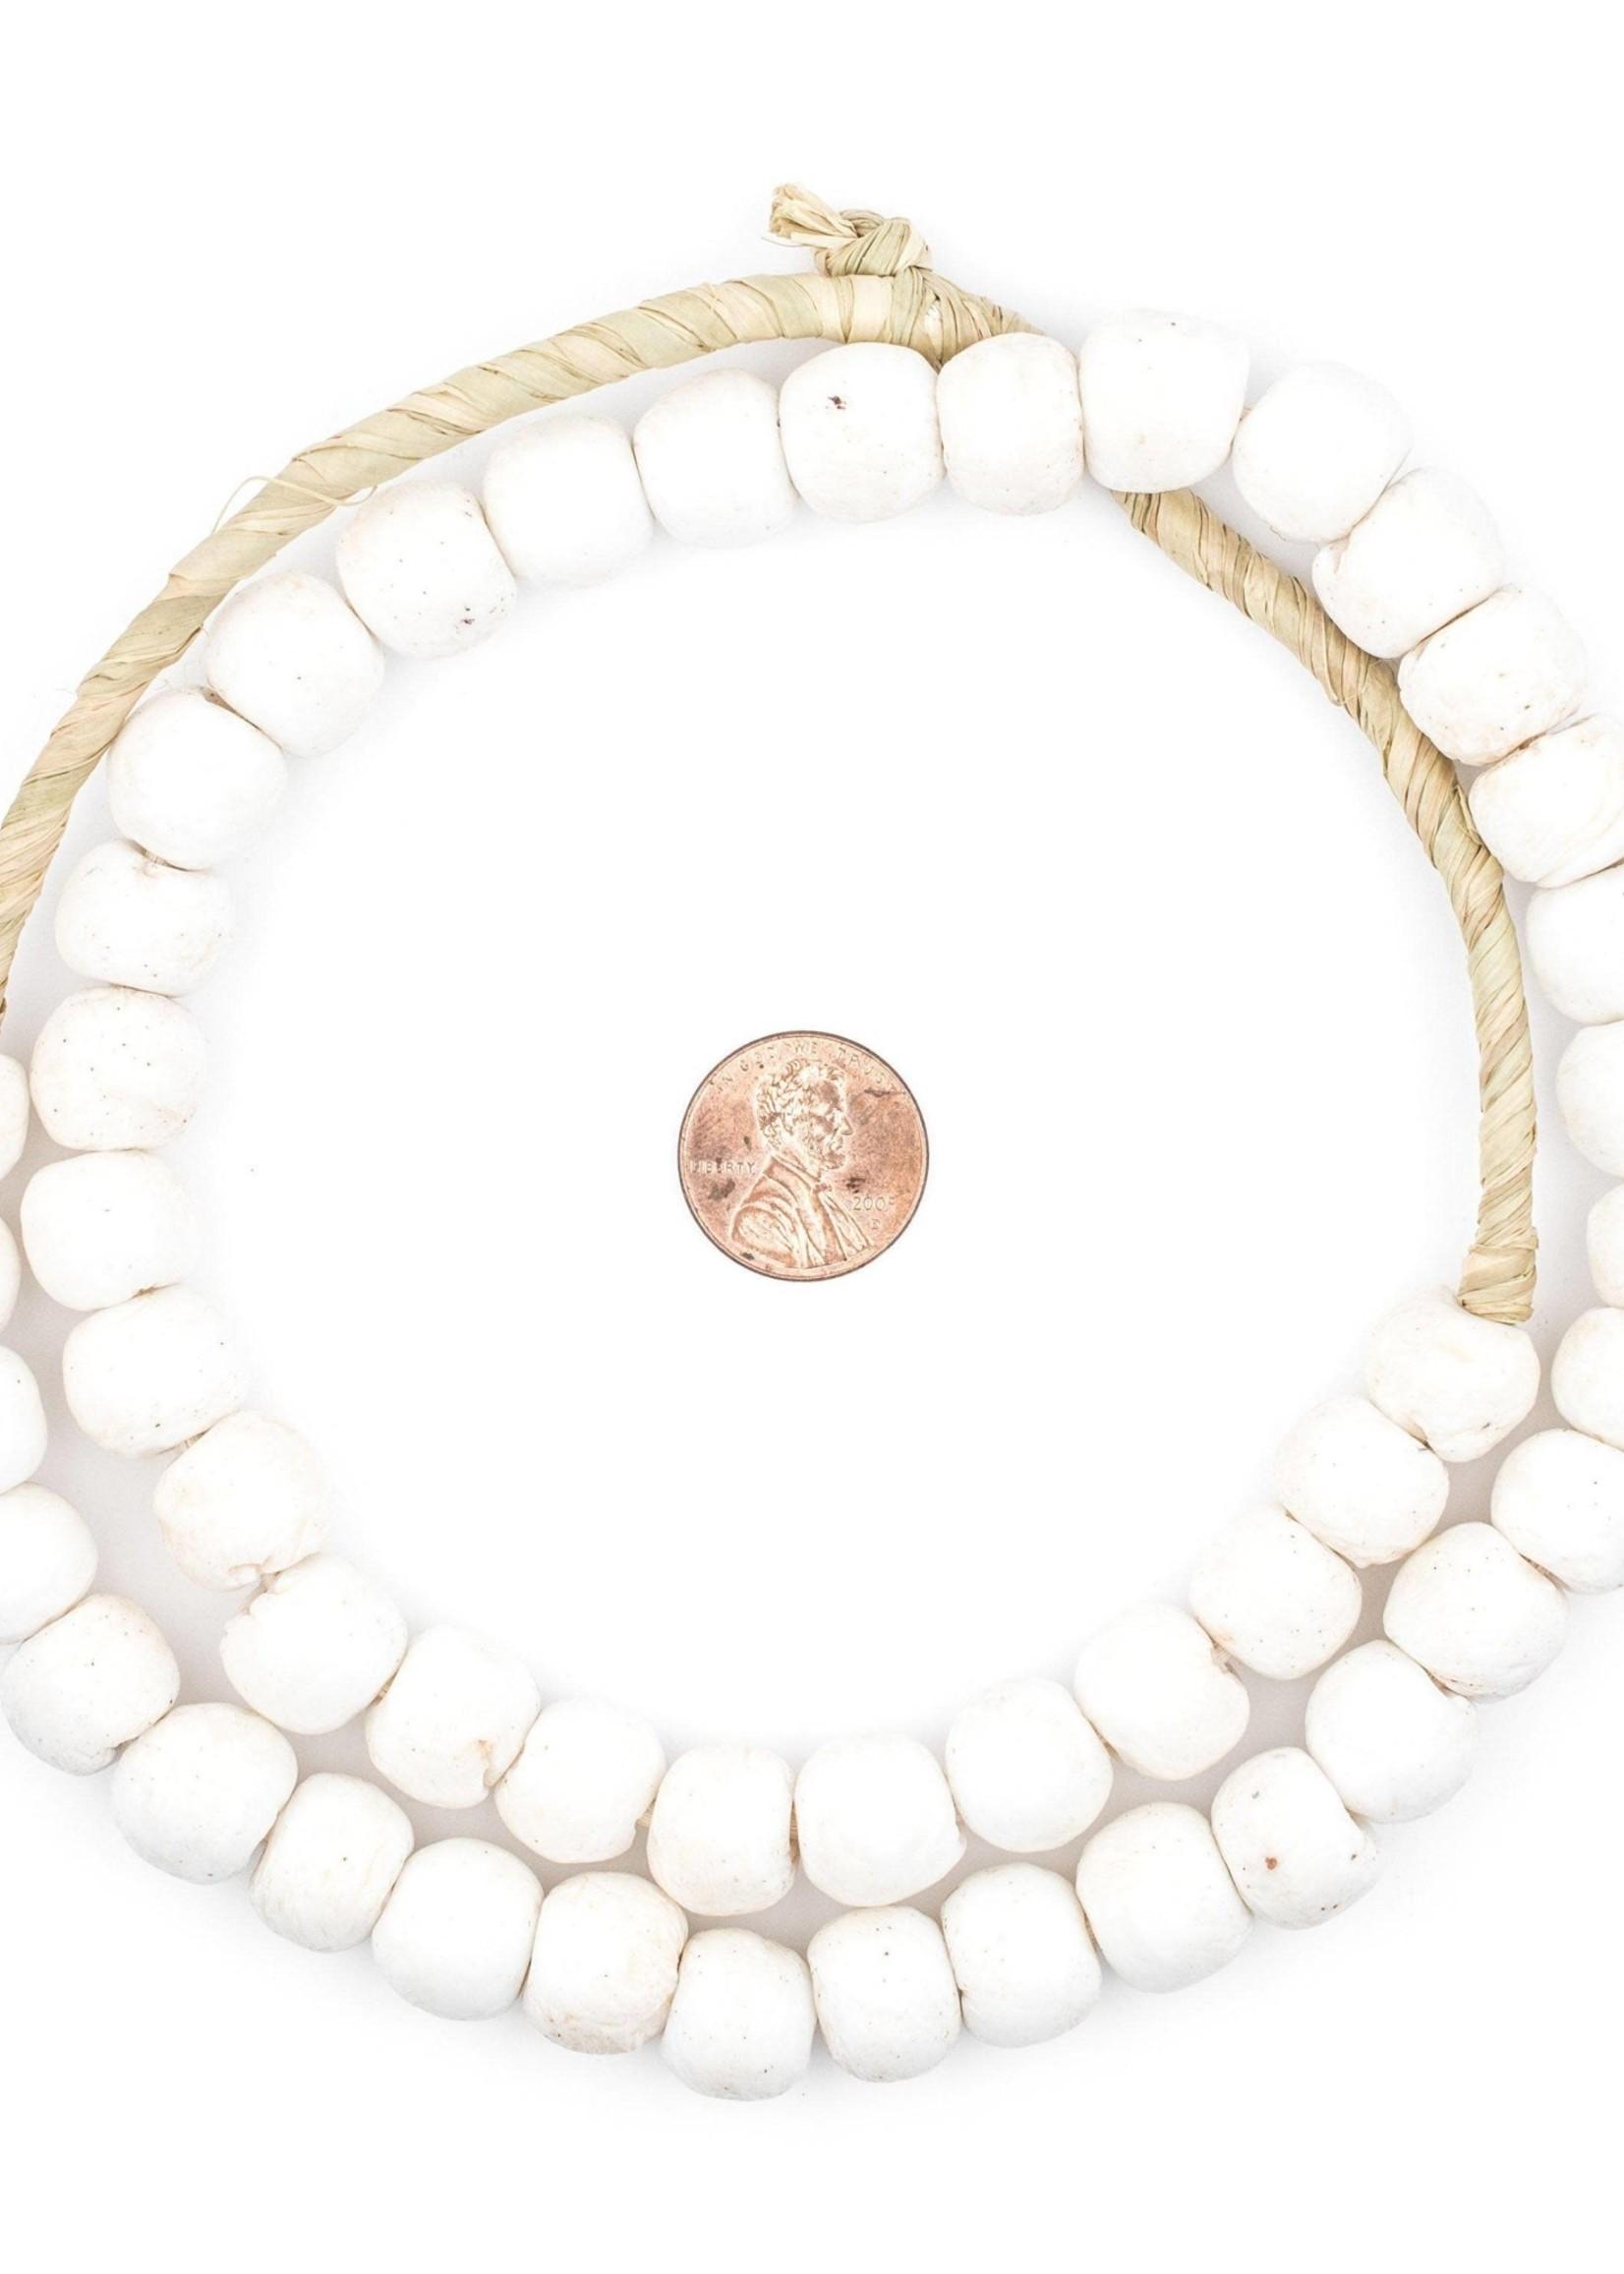 14mm White Round Sandcast Beads